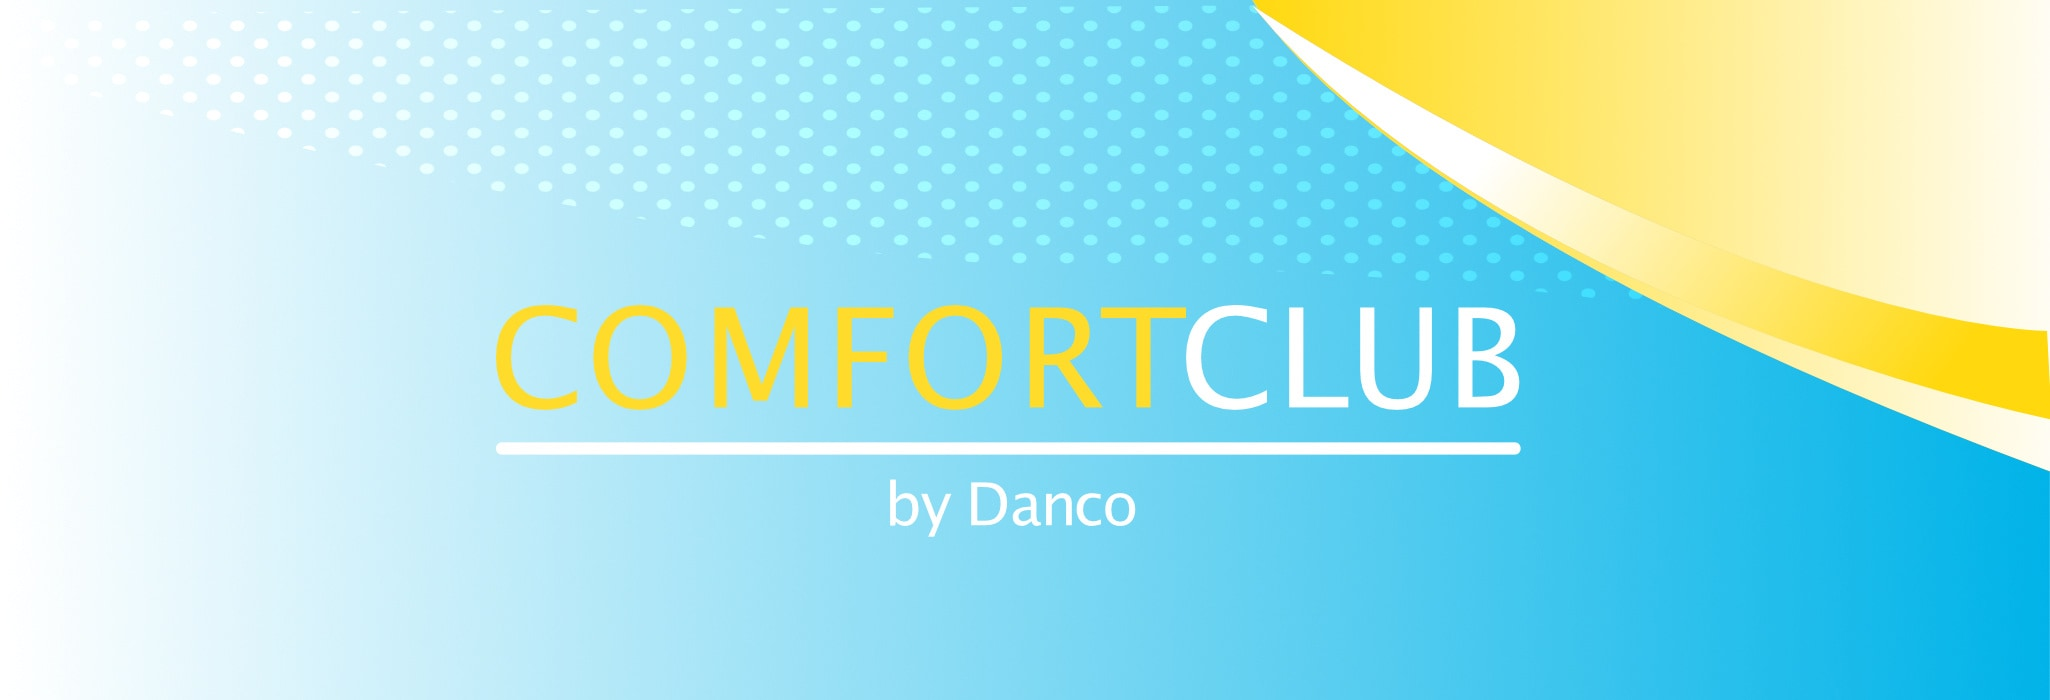 Comfort Club Banner 2